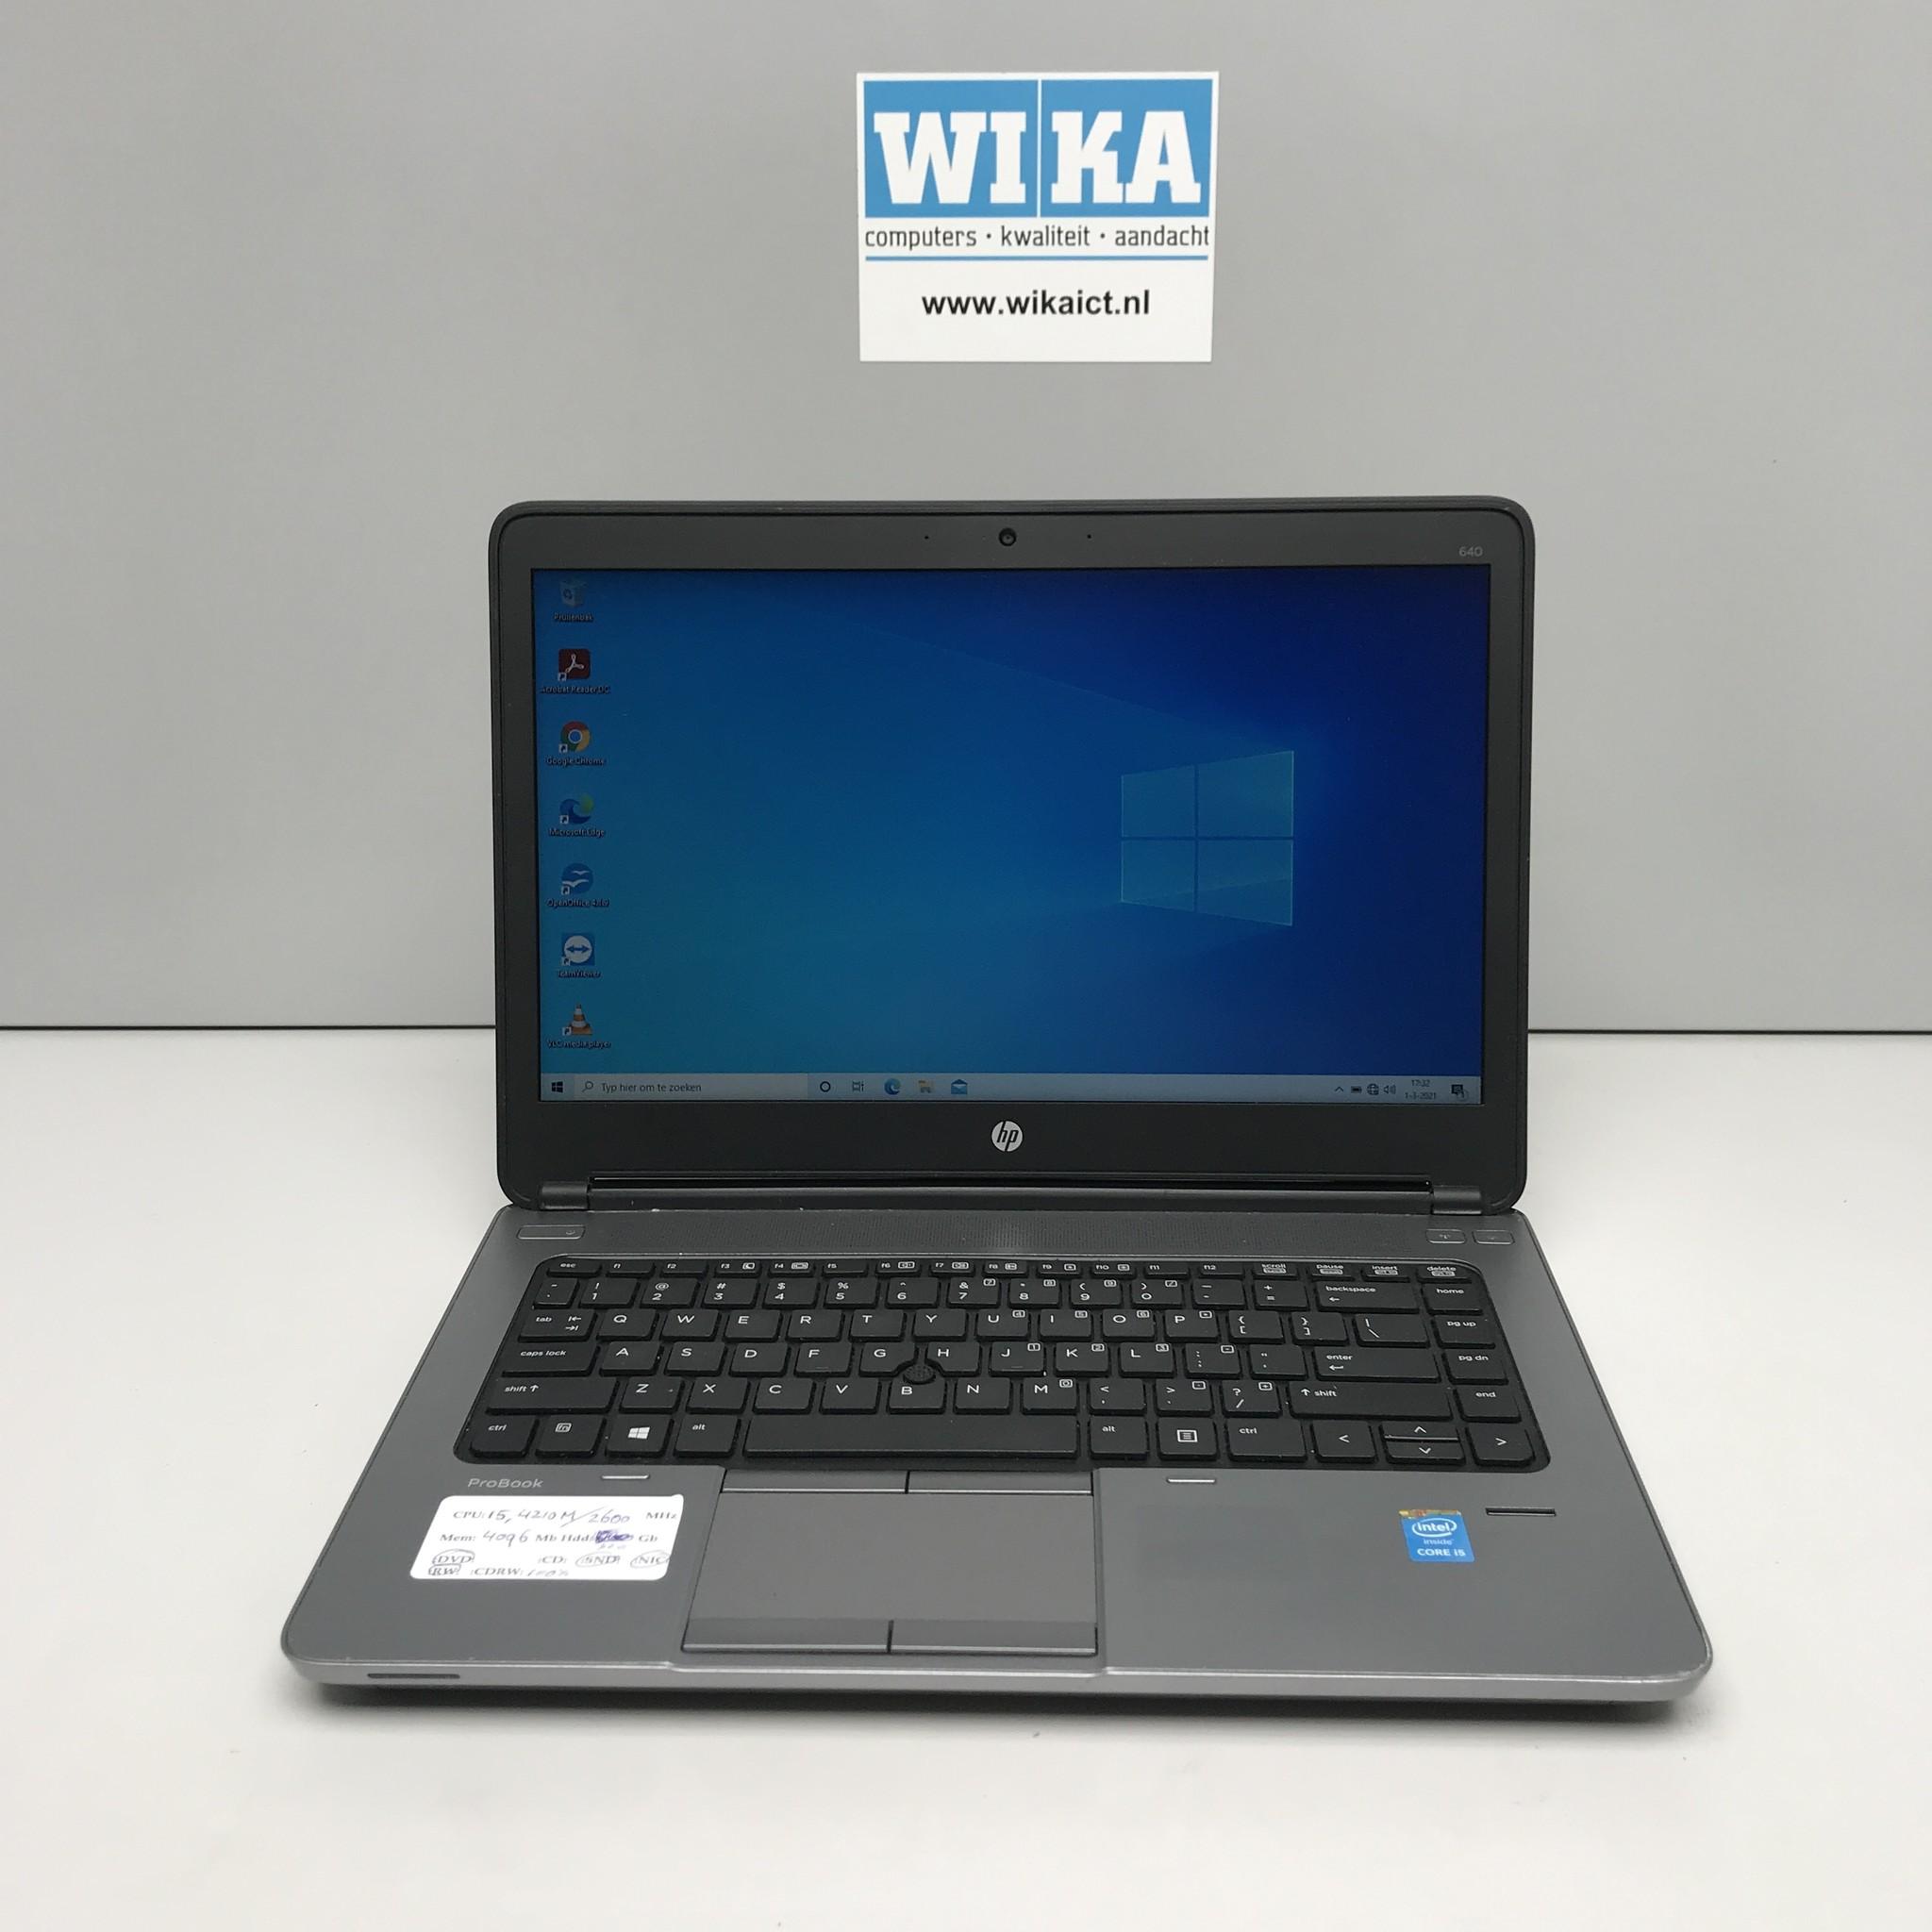 HP Probook 640 G1 Core i5 4Gb 128gb ssd 14.1 W10p laptop